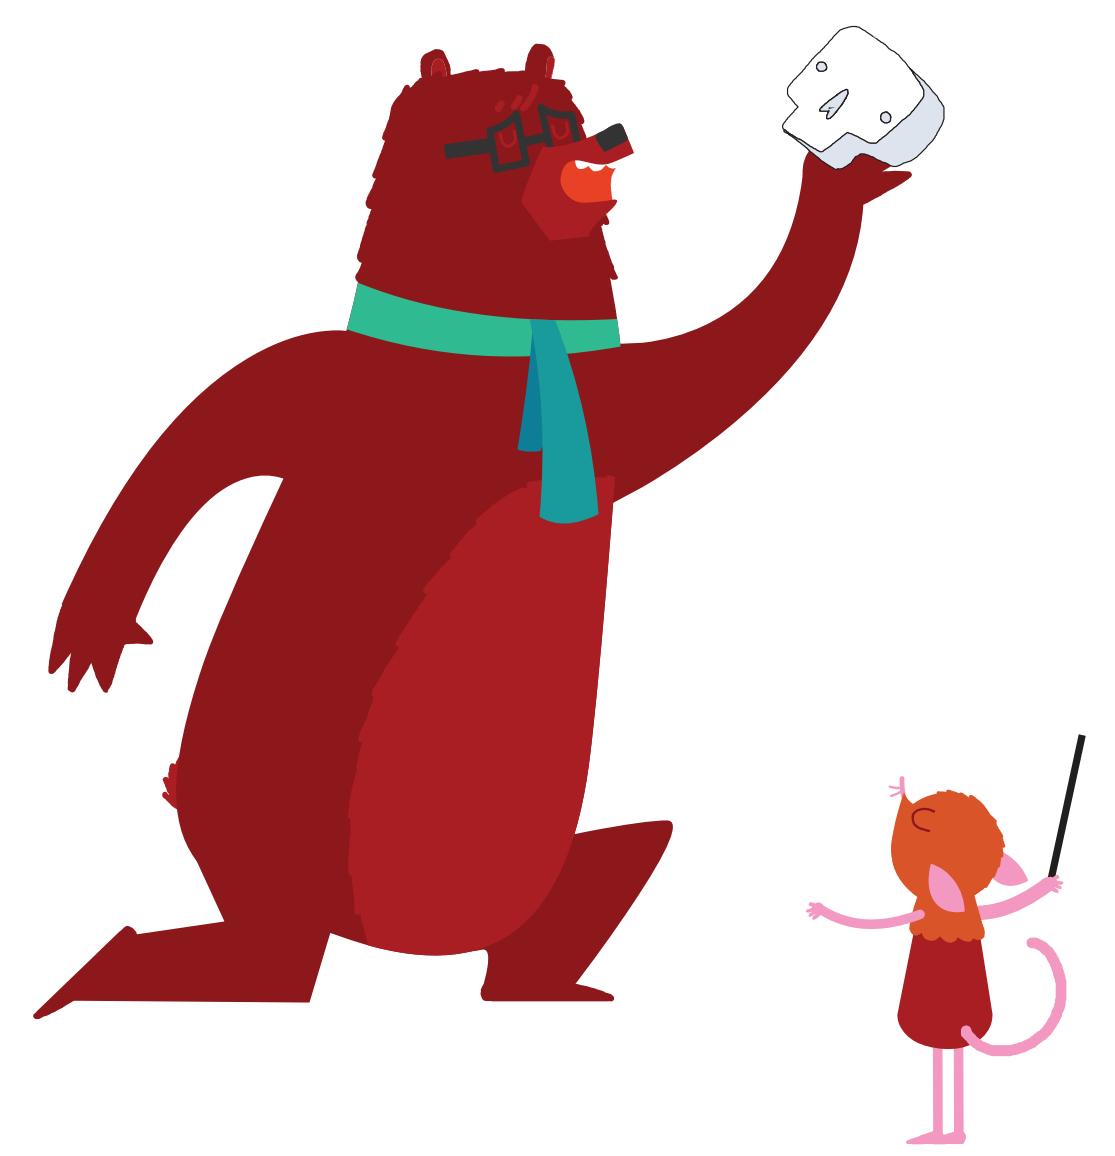 An illustration of a bear holding a skull pretending to be Hamlet